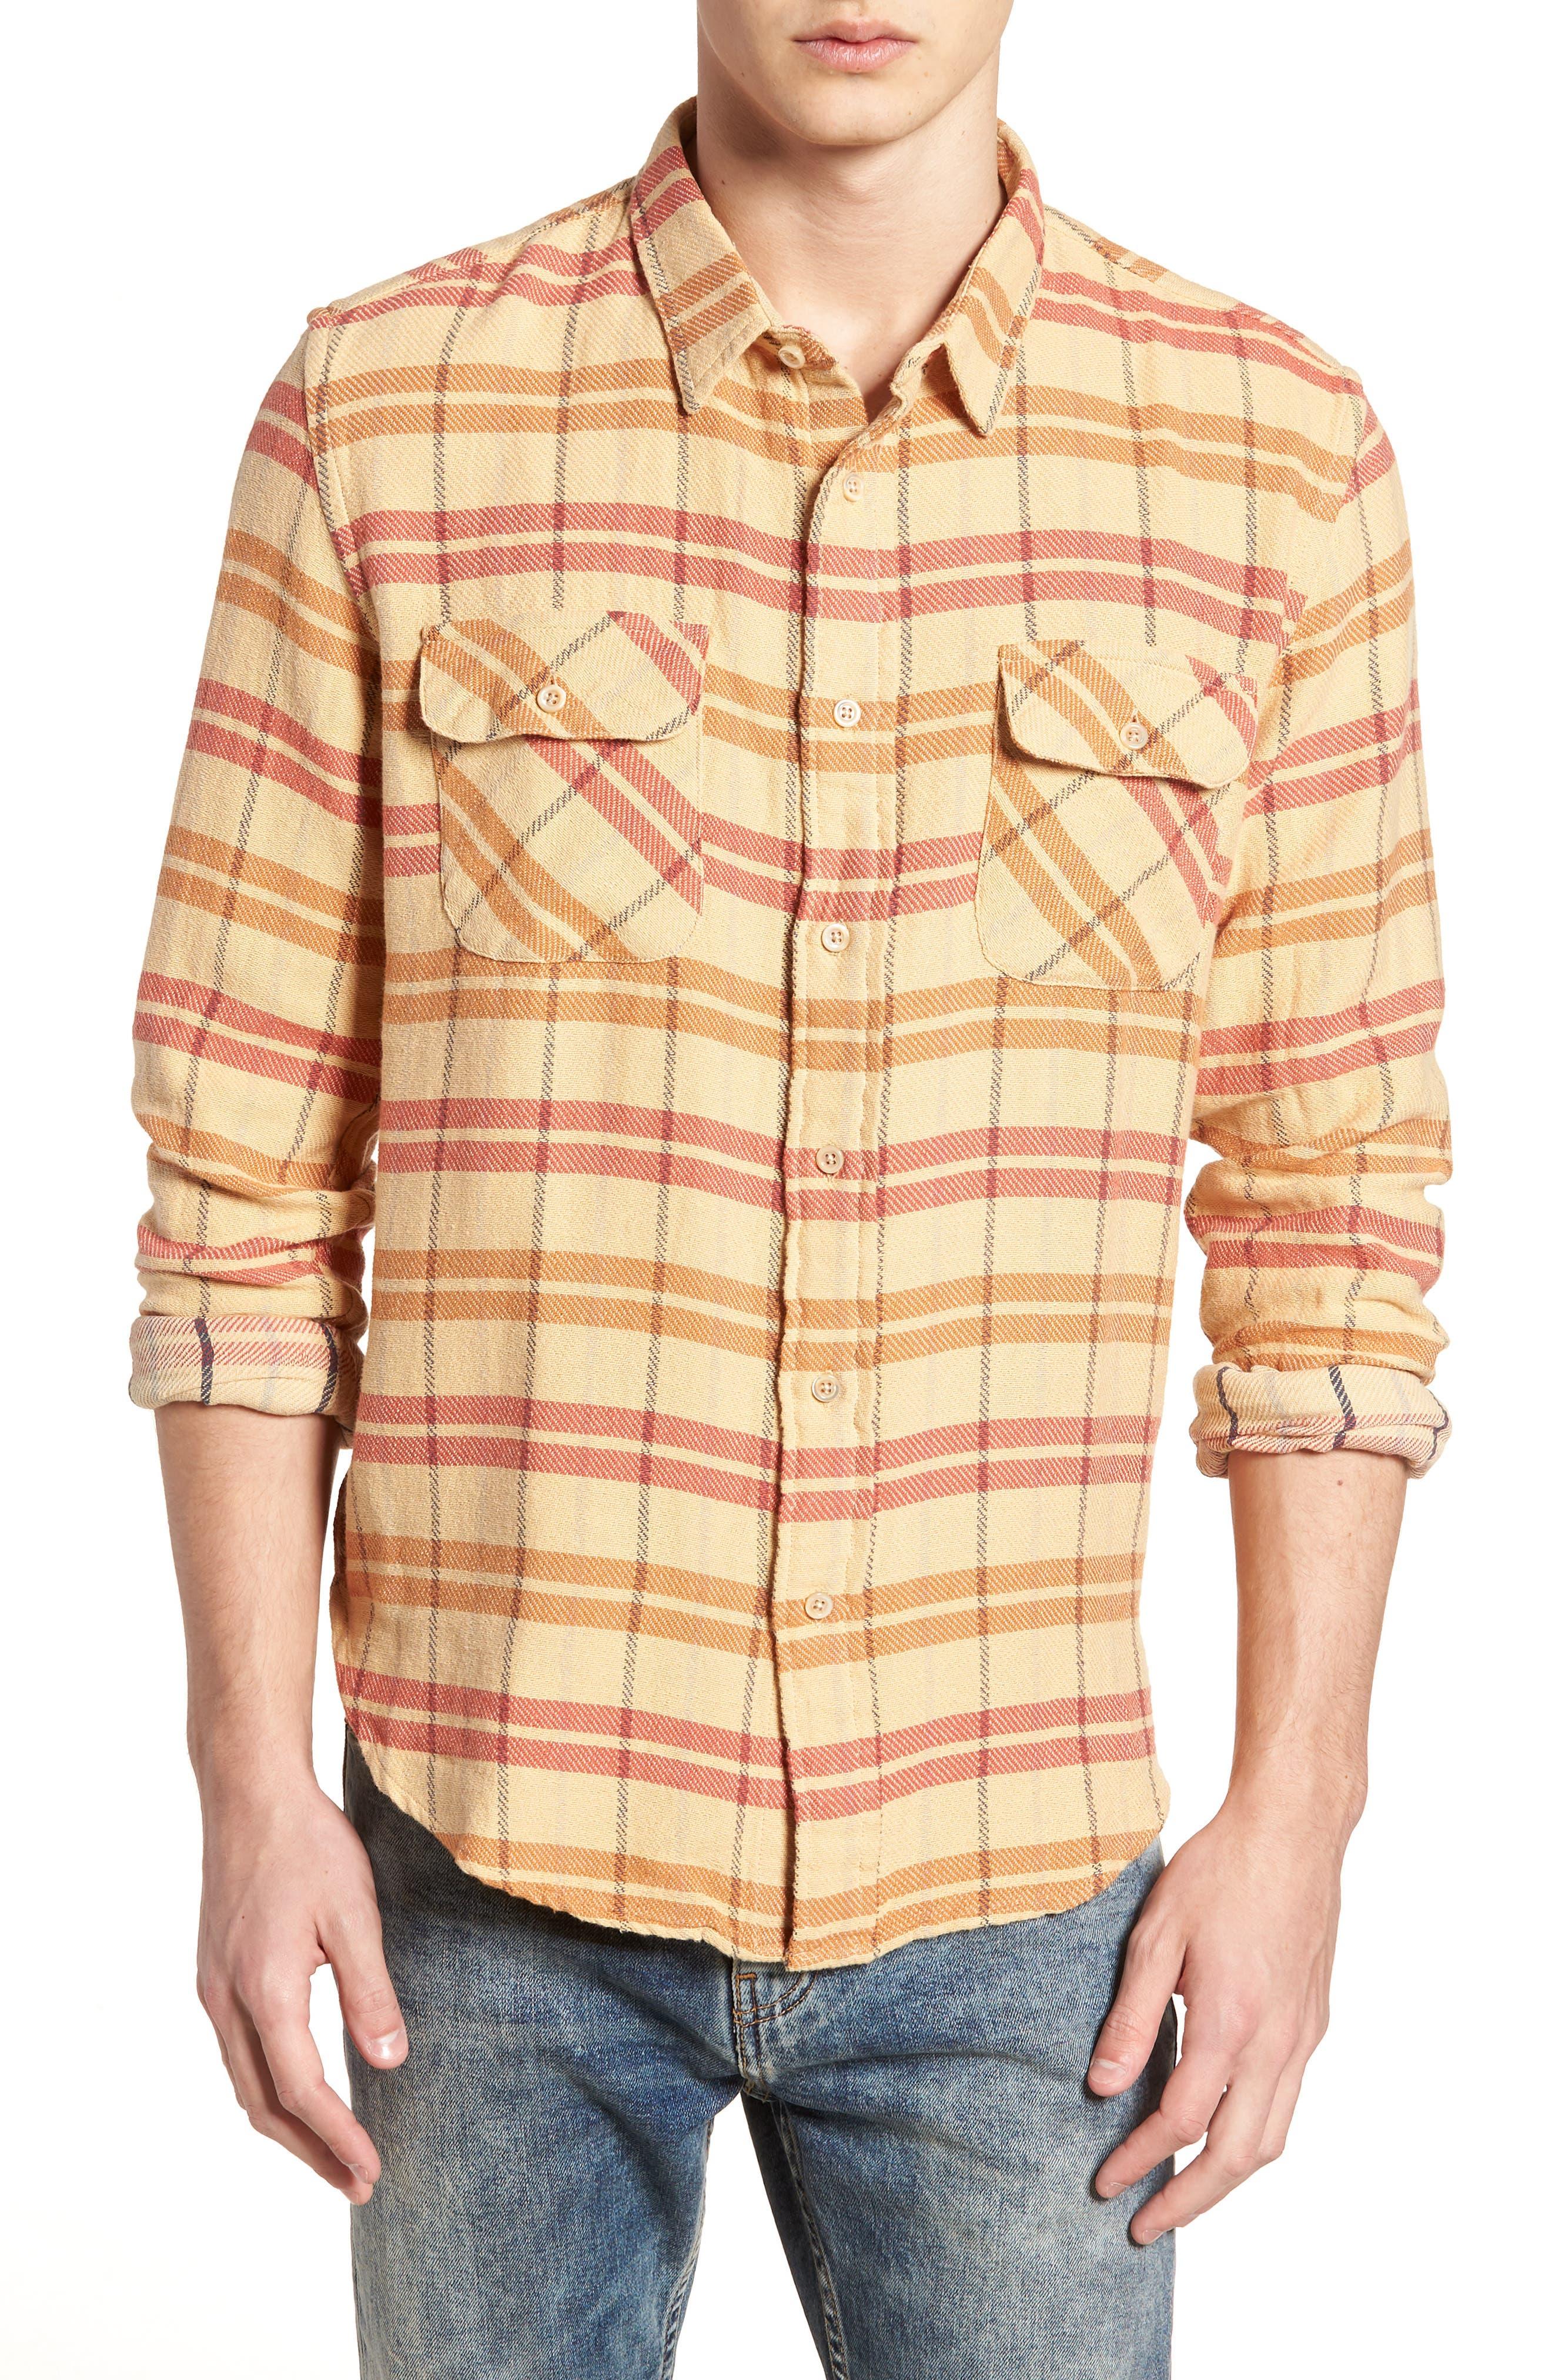 Shorthorn Western Shirt,                         Main,                         color, Sunfaded Orange